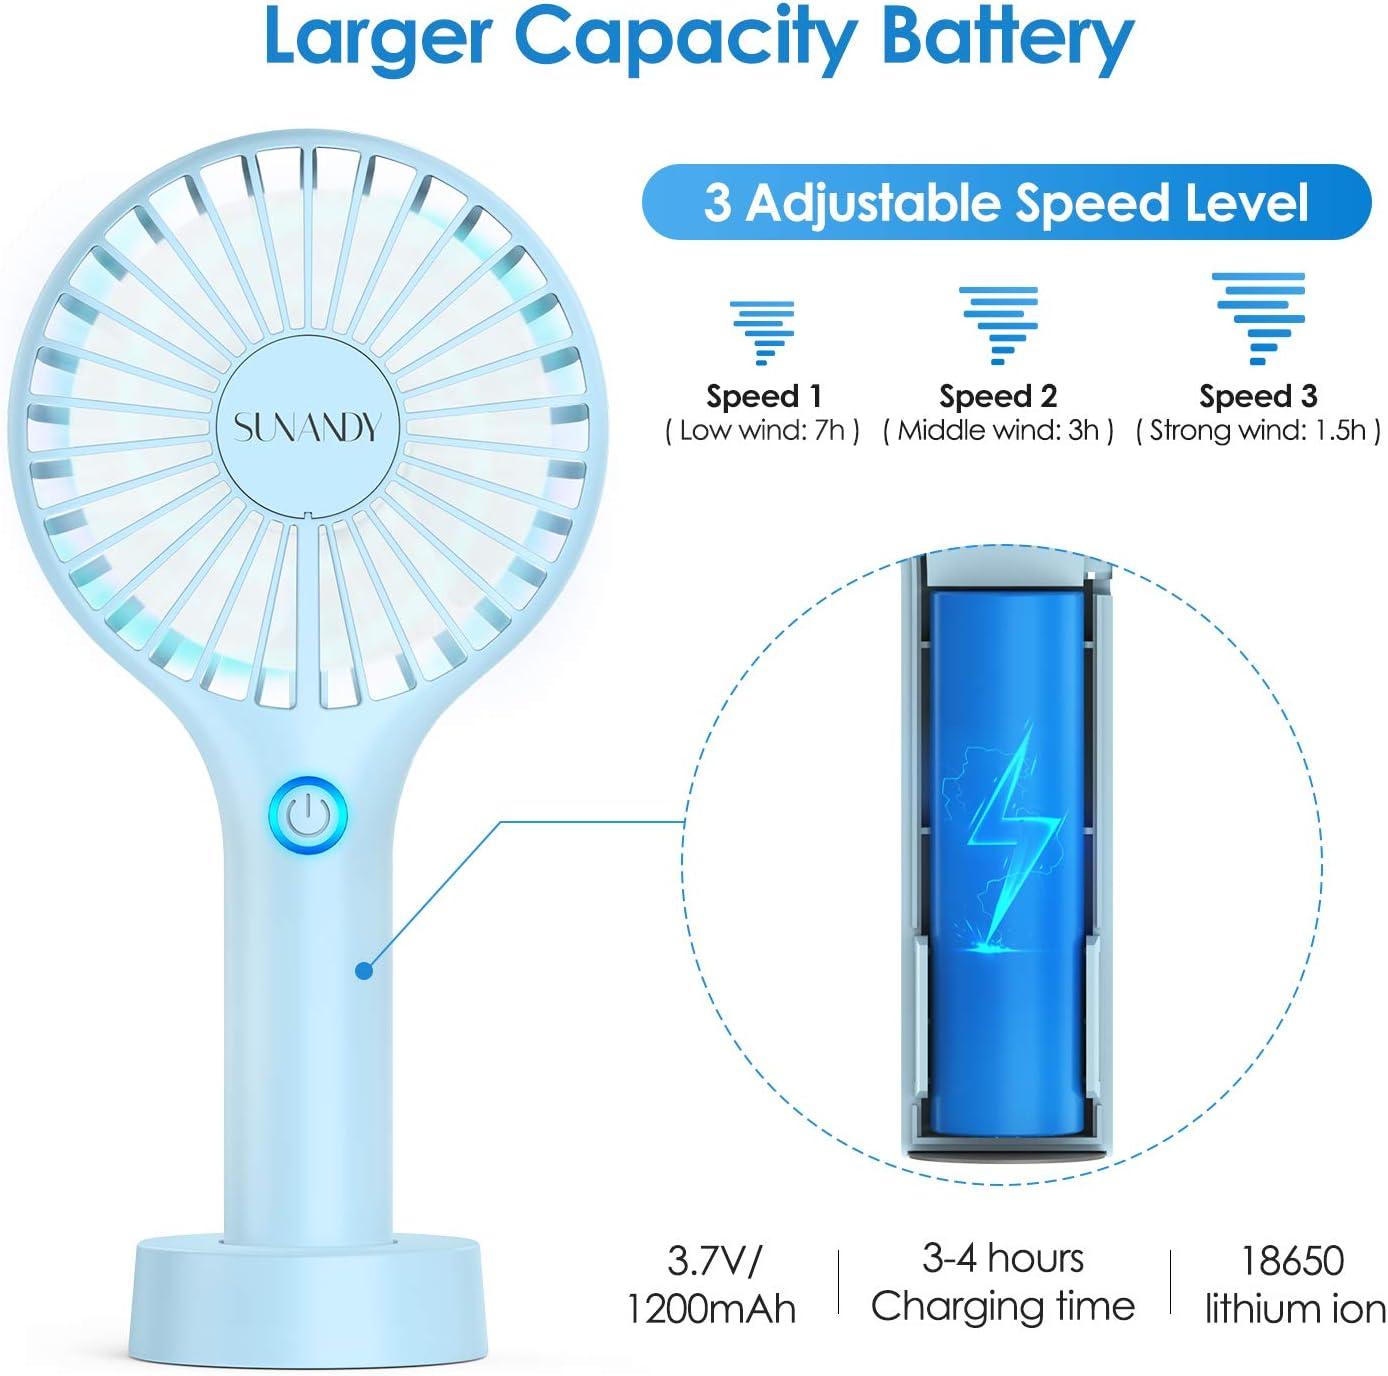 Sunandy Ventilador de Mano Mini Ventilador portátil Ventilador USB ...